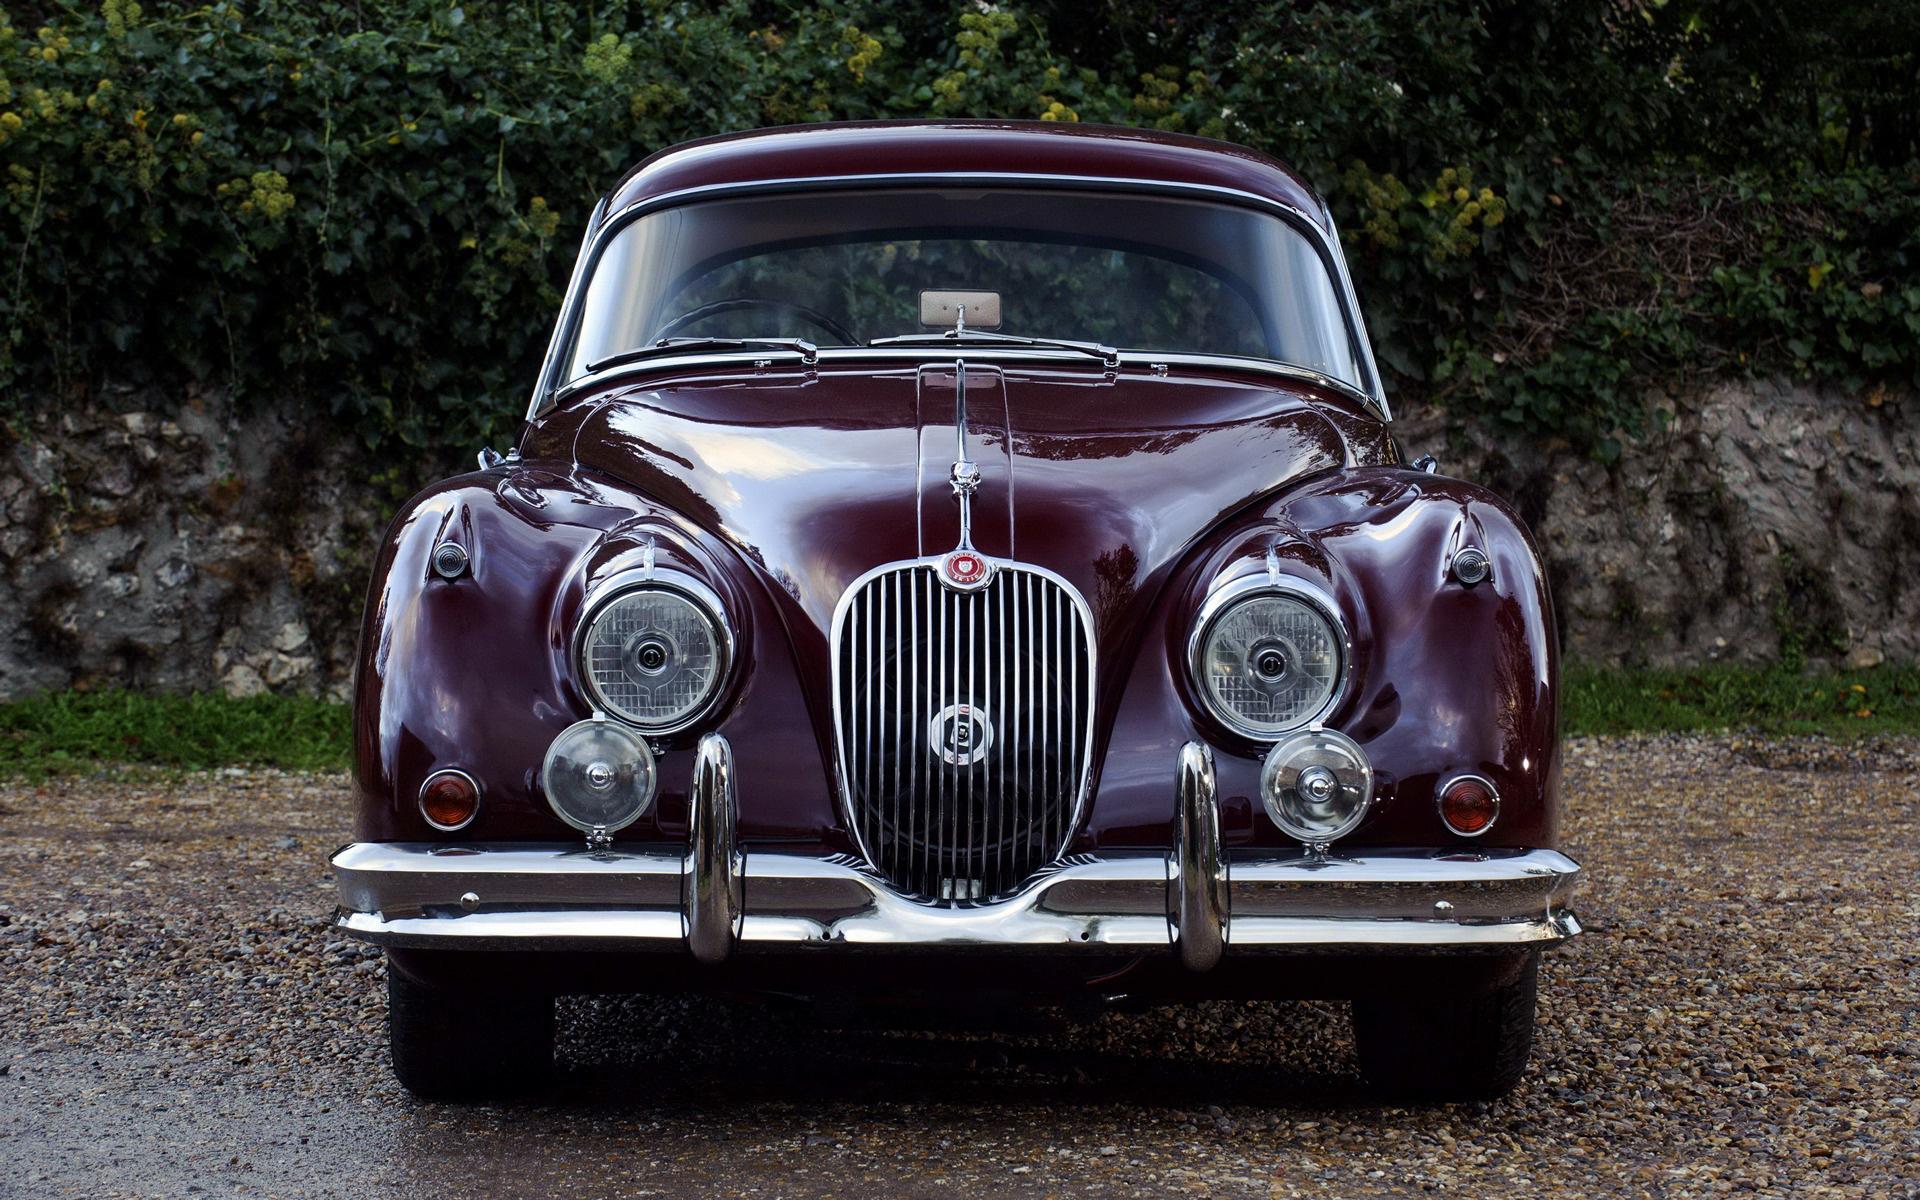 1958 Jaguar Xk150 Se Fixed Head Coupe Uk Wallpapers